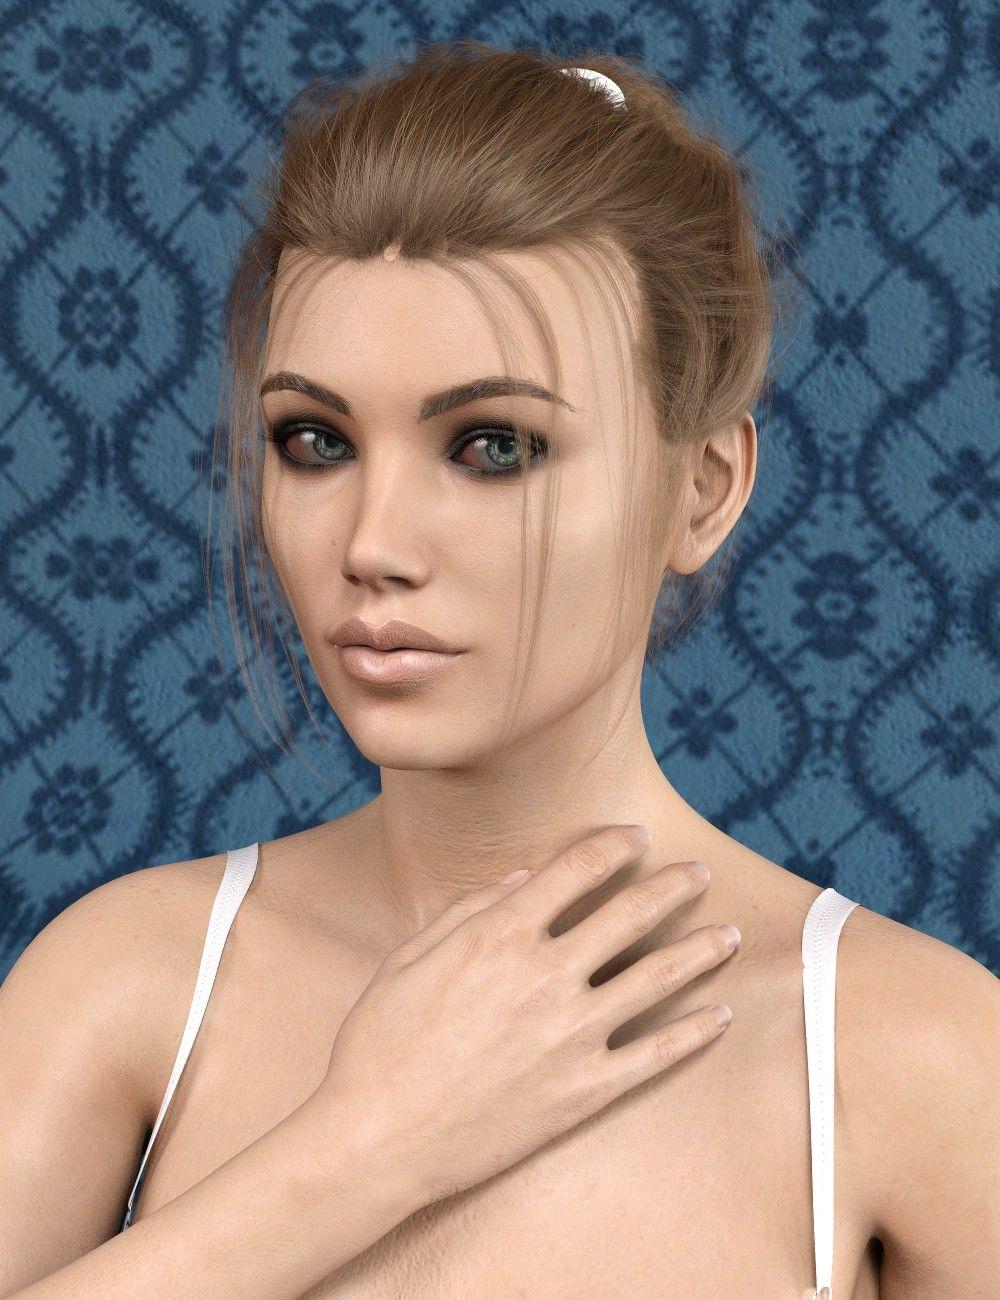 SF Beautiful Skin Iray Genesis 8 Female | 3D Models and 3D